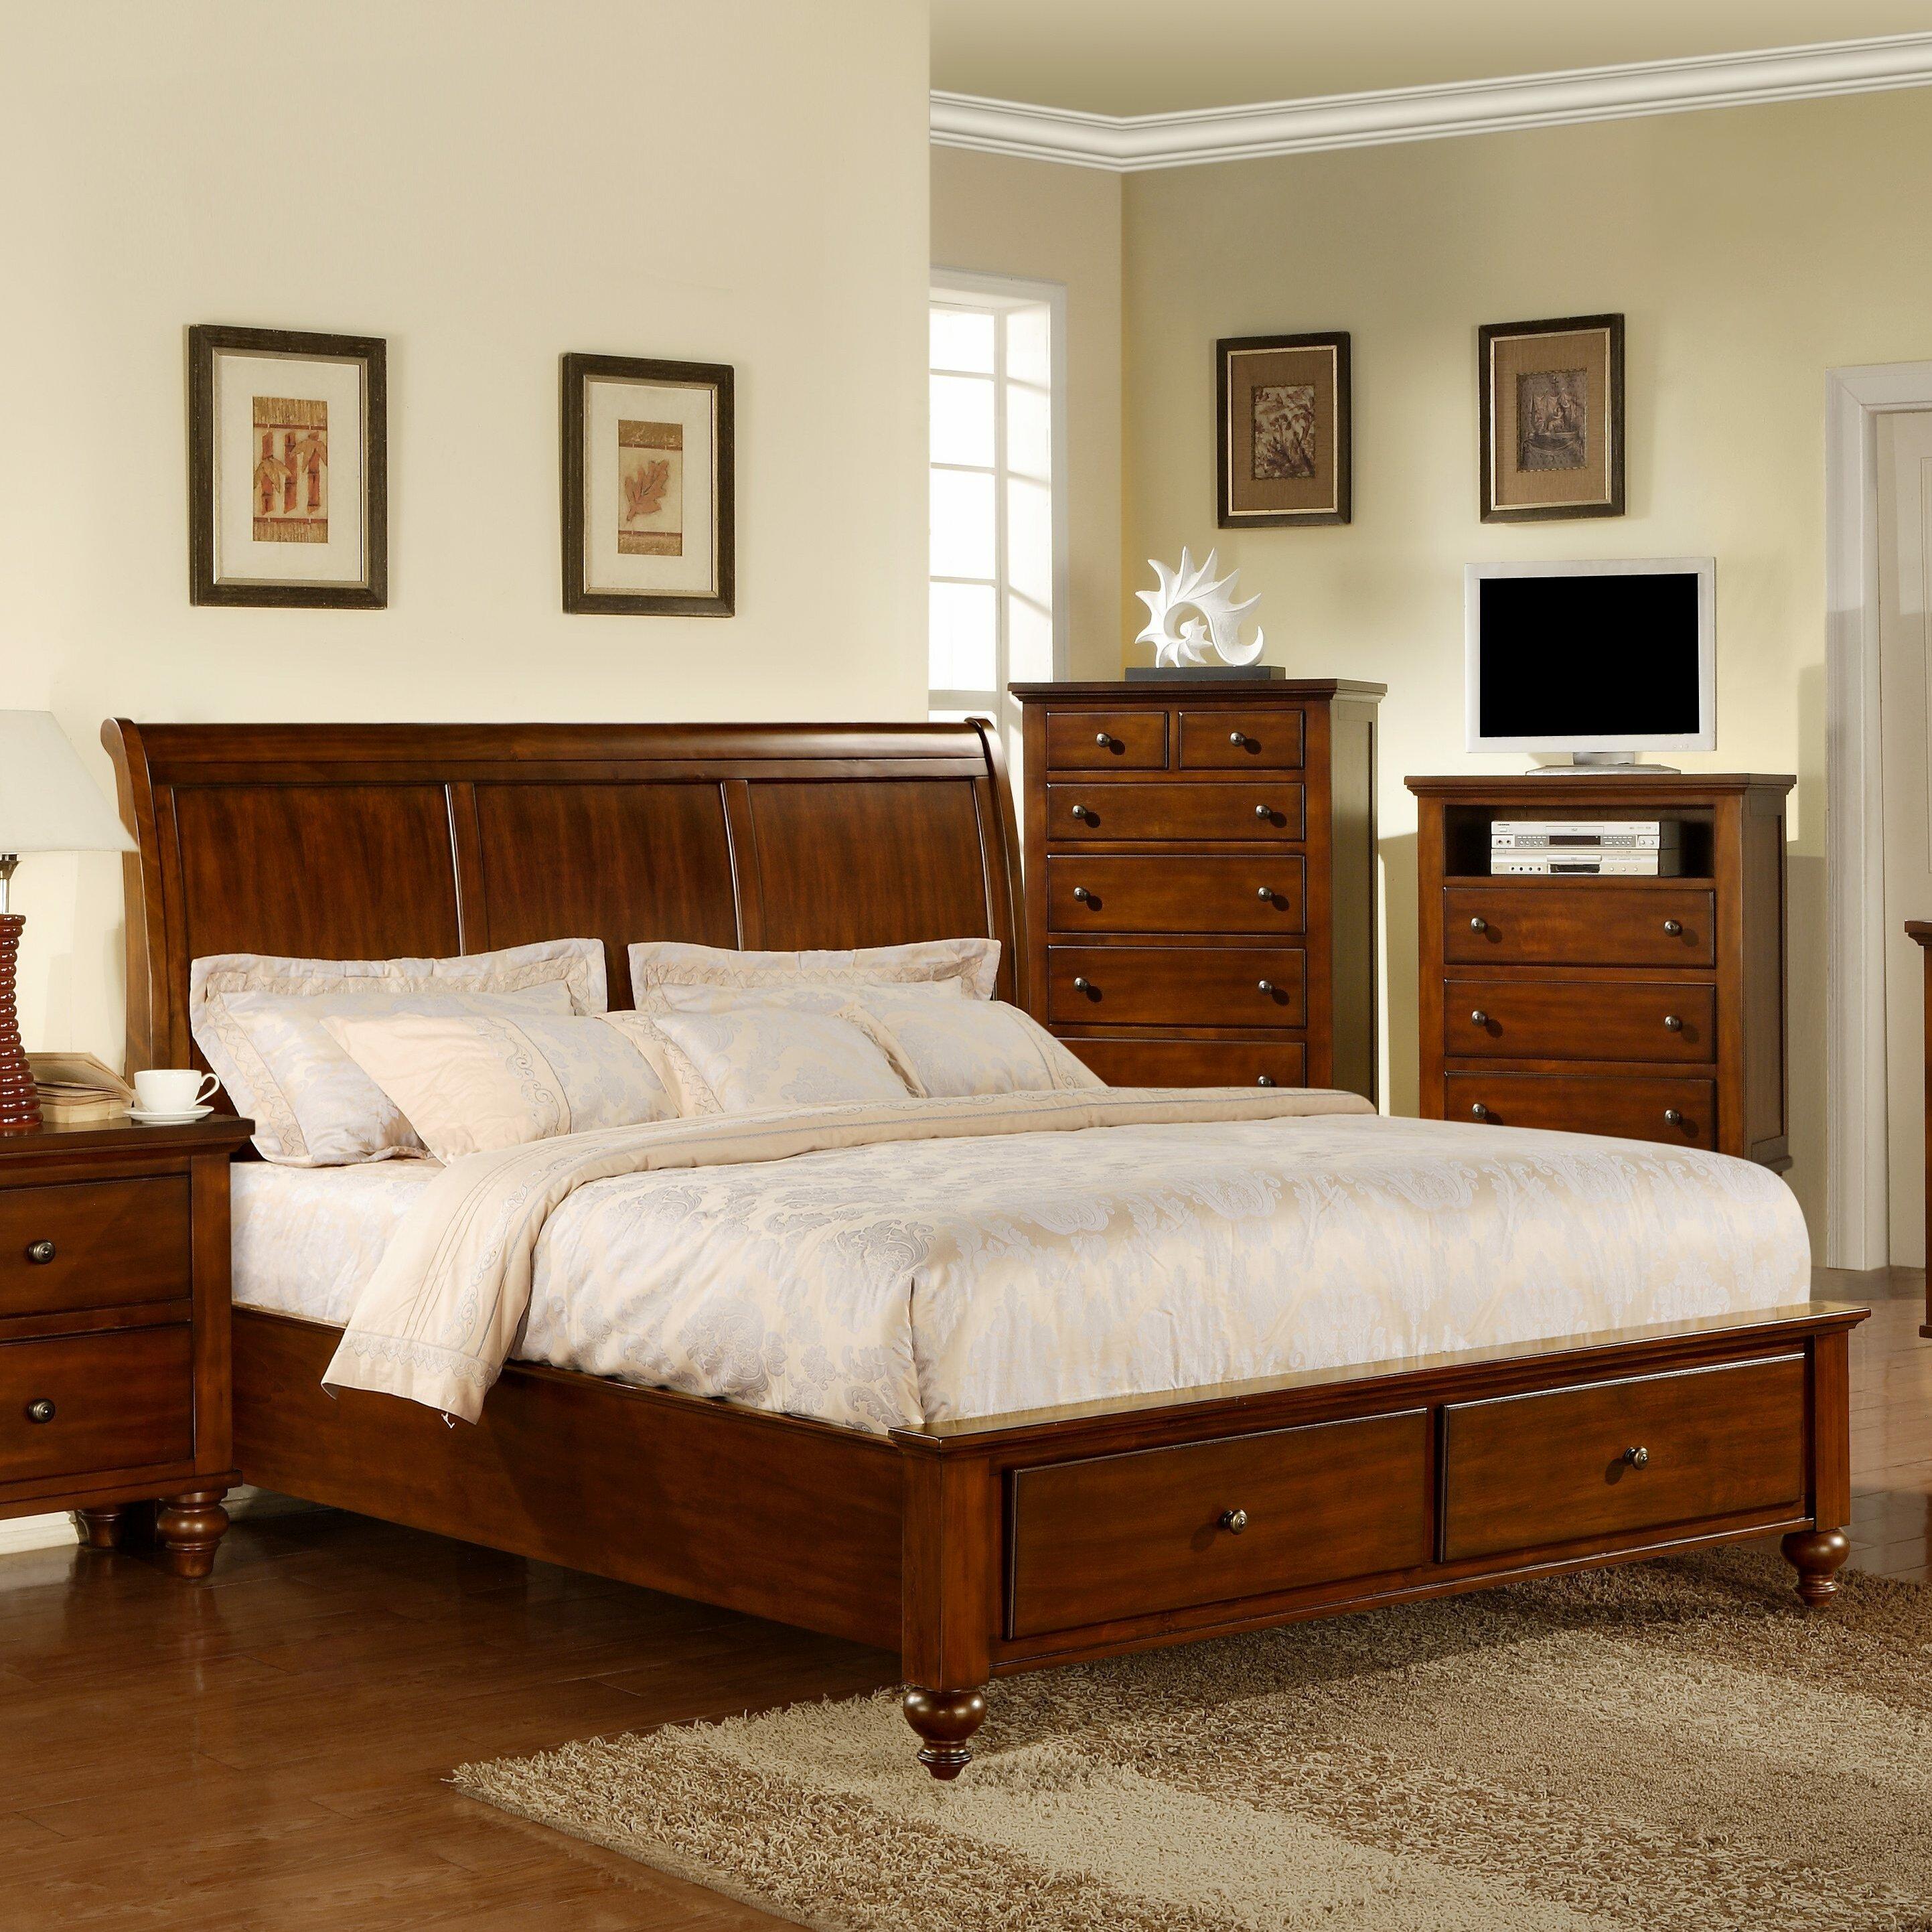 darby home co lilian platform customizable bedroom set reviews wayfair